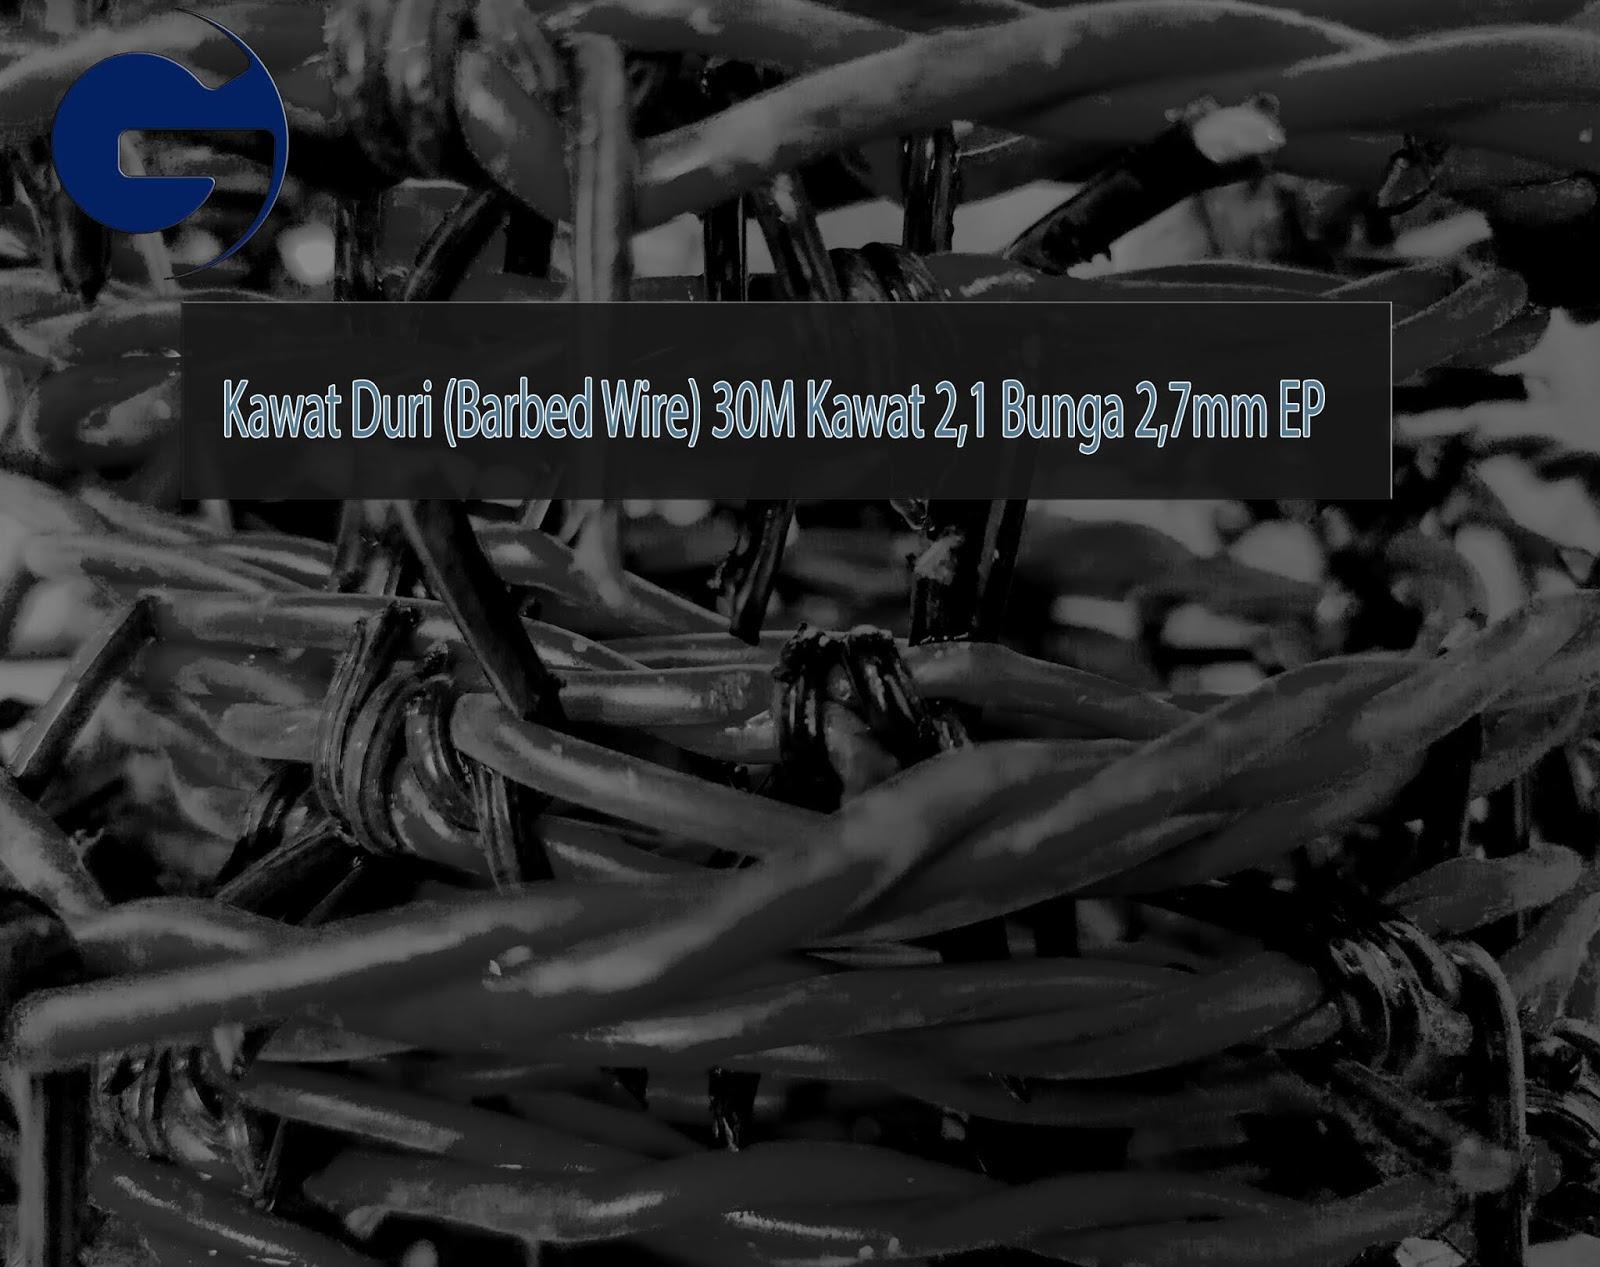 Jual Kawat Duri SNI 30M Kawat 2,1mm bunga 2,7mm EP